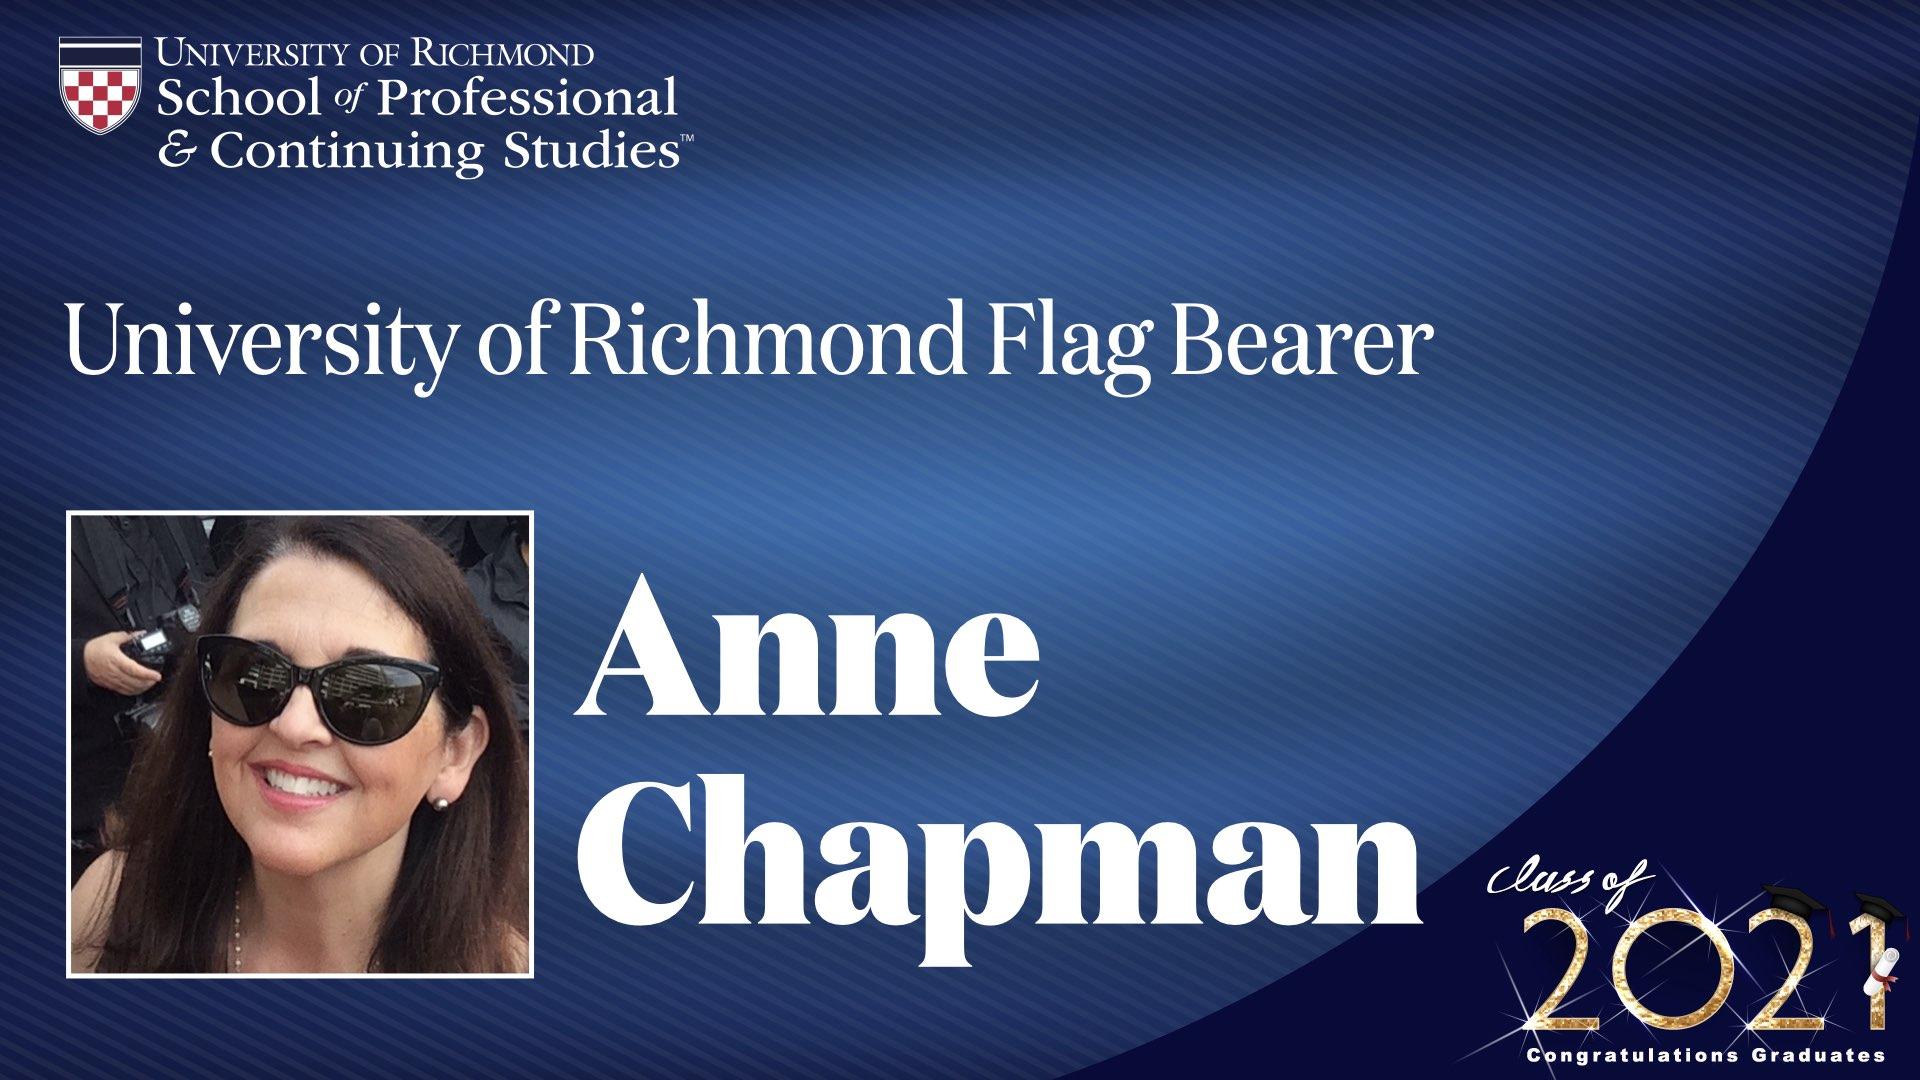 Anne Chapman headshot and award name